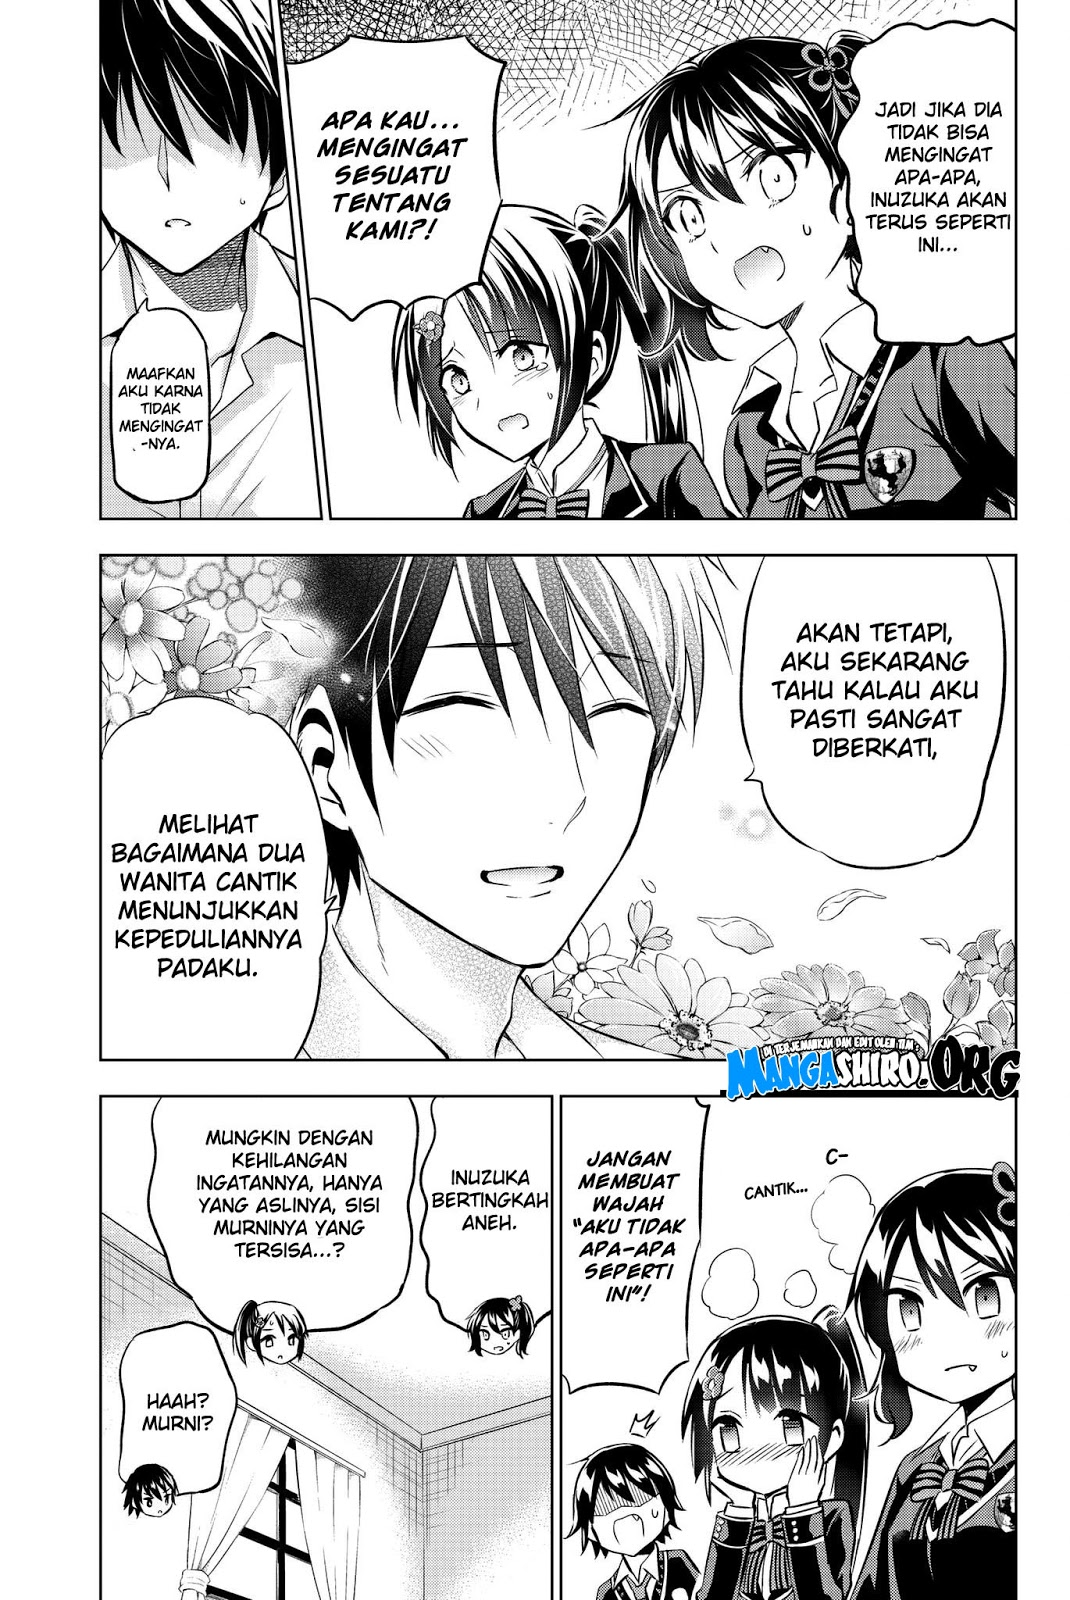 Kishuku Gakkou no Juliet: Chapter 75 - Page 8